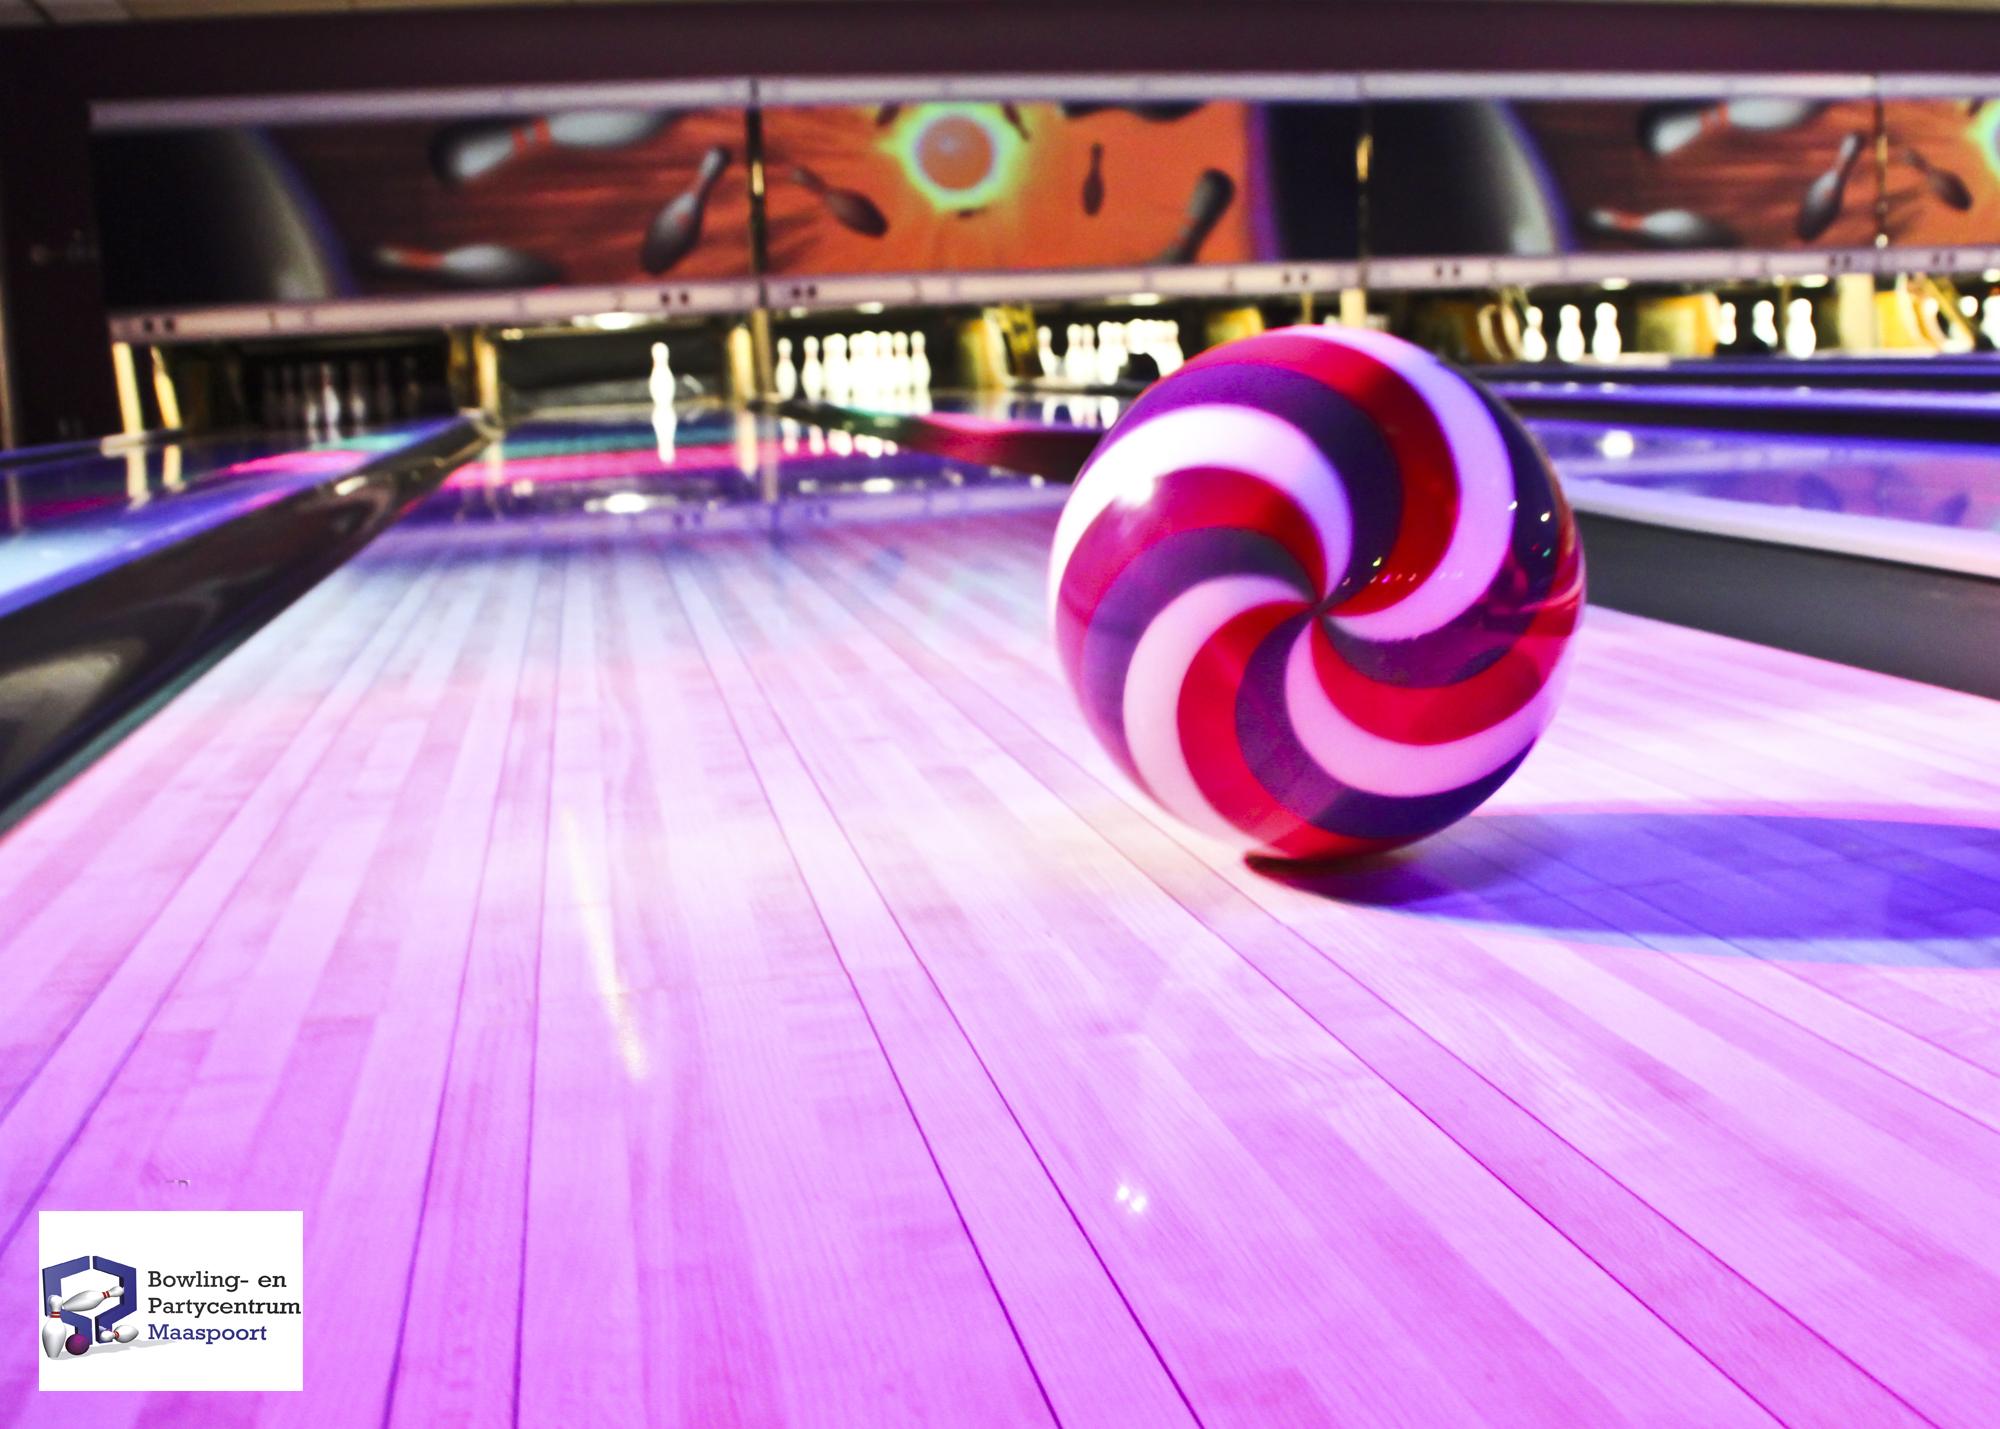 disco-bowlen-maaspoort_22